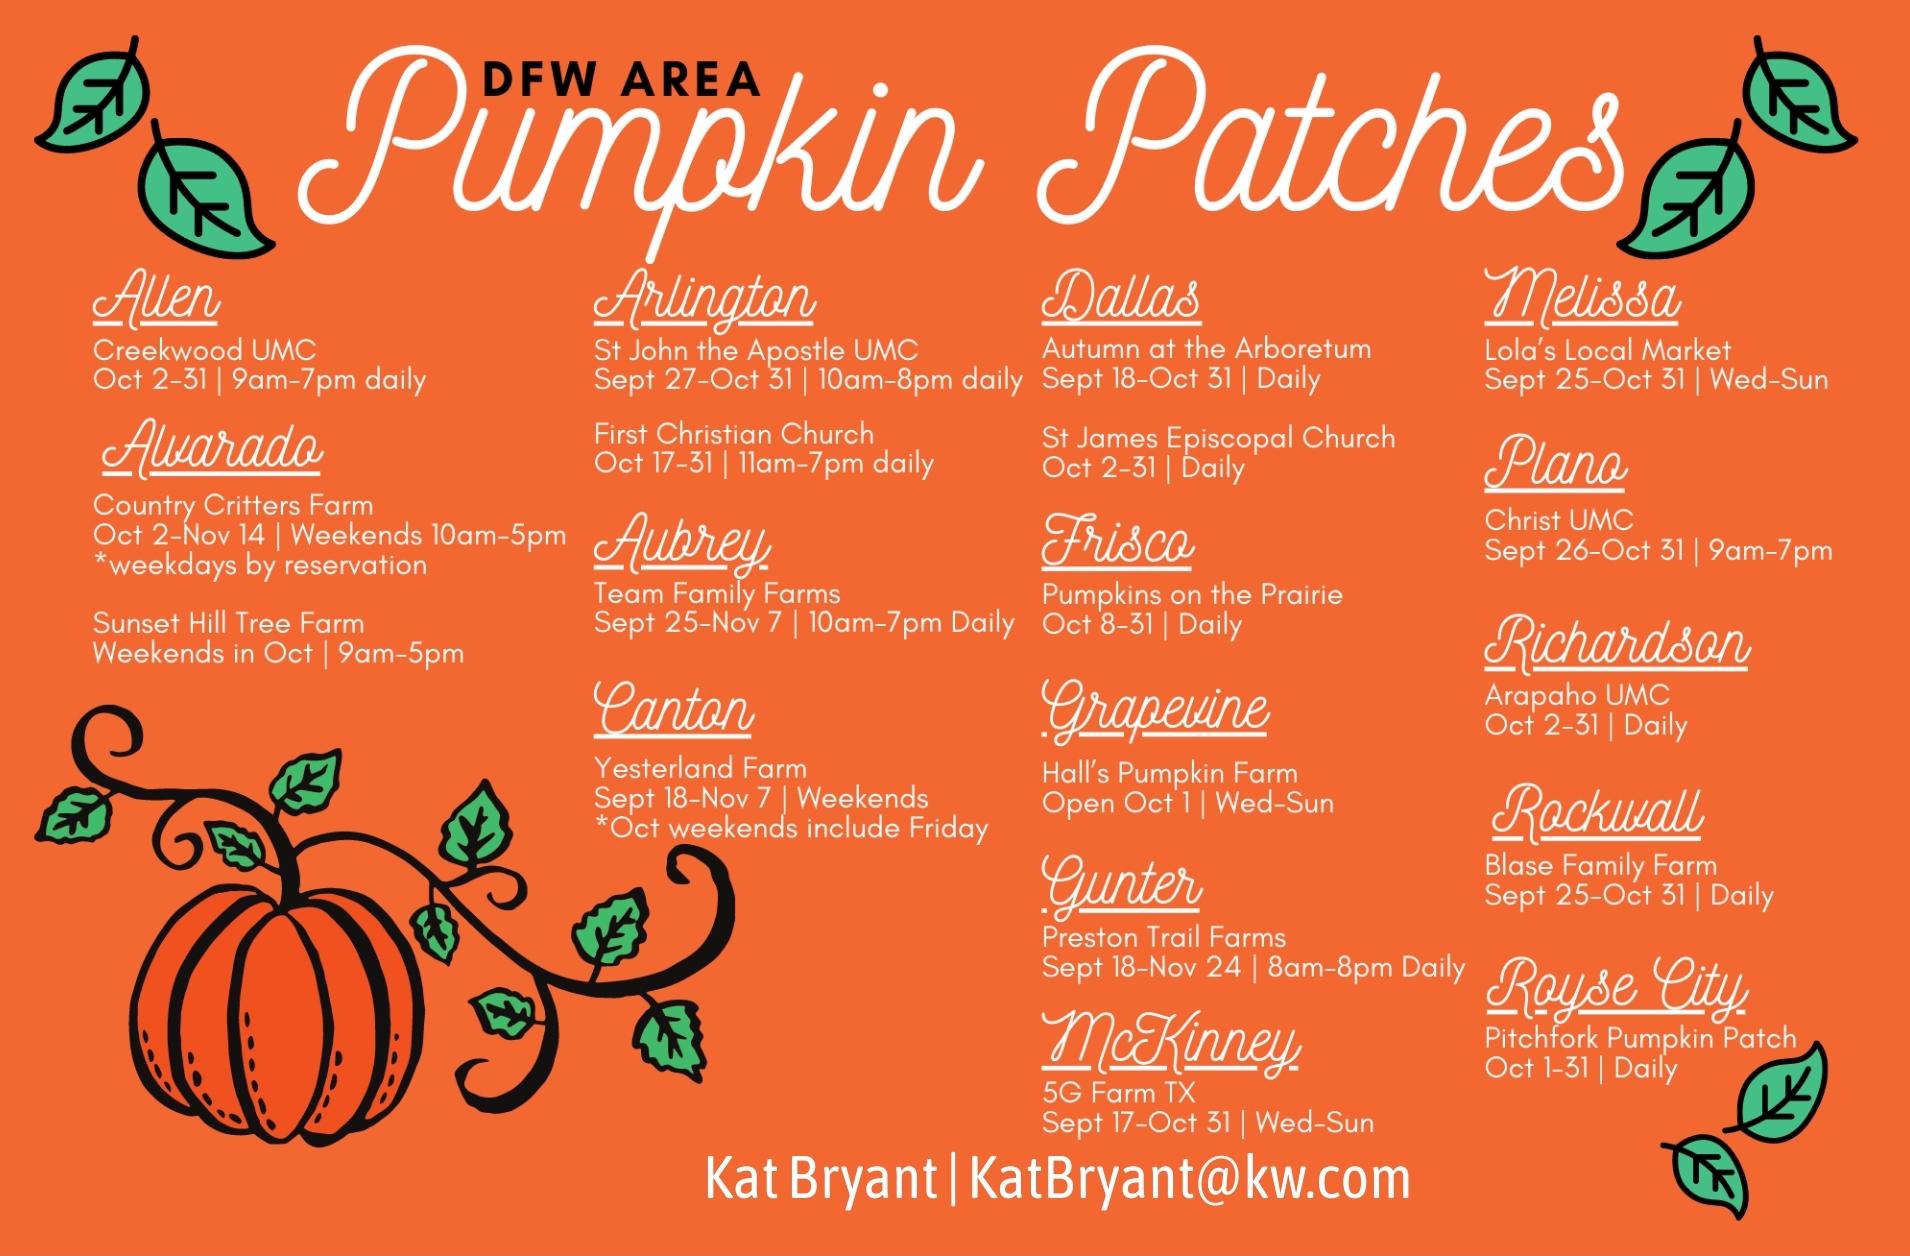 DFW Pumpkin Patches 2021